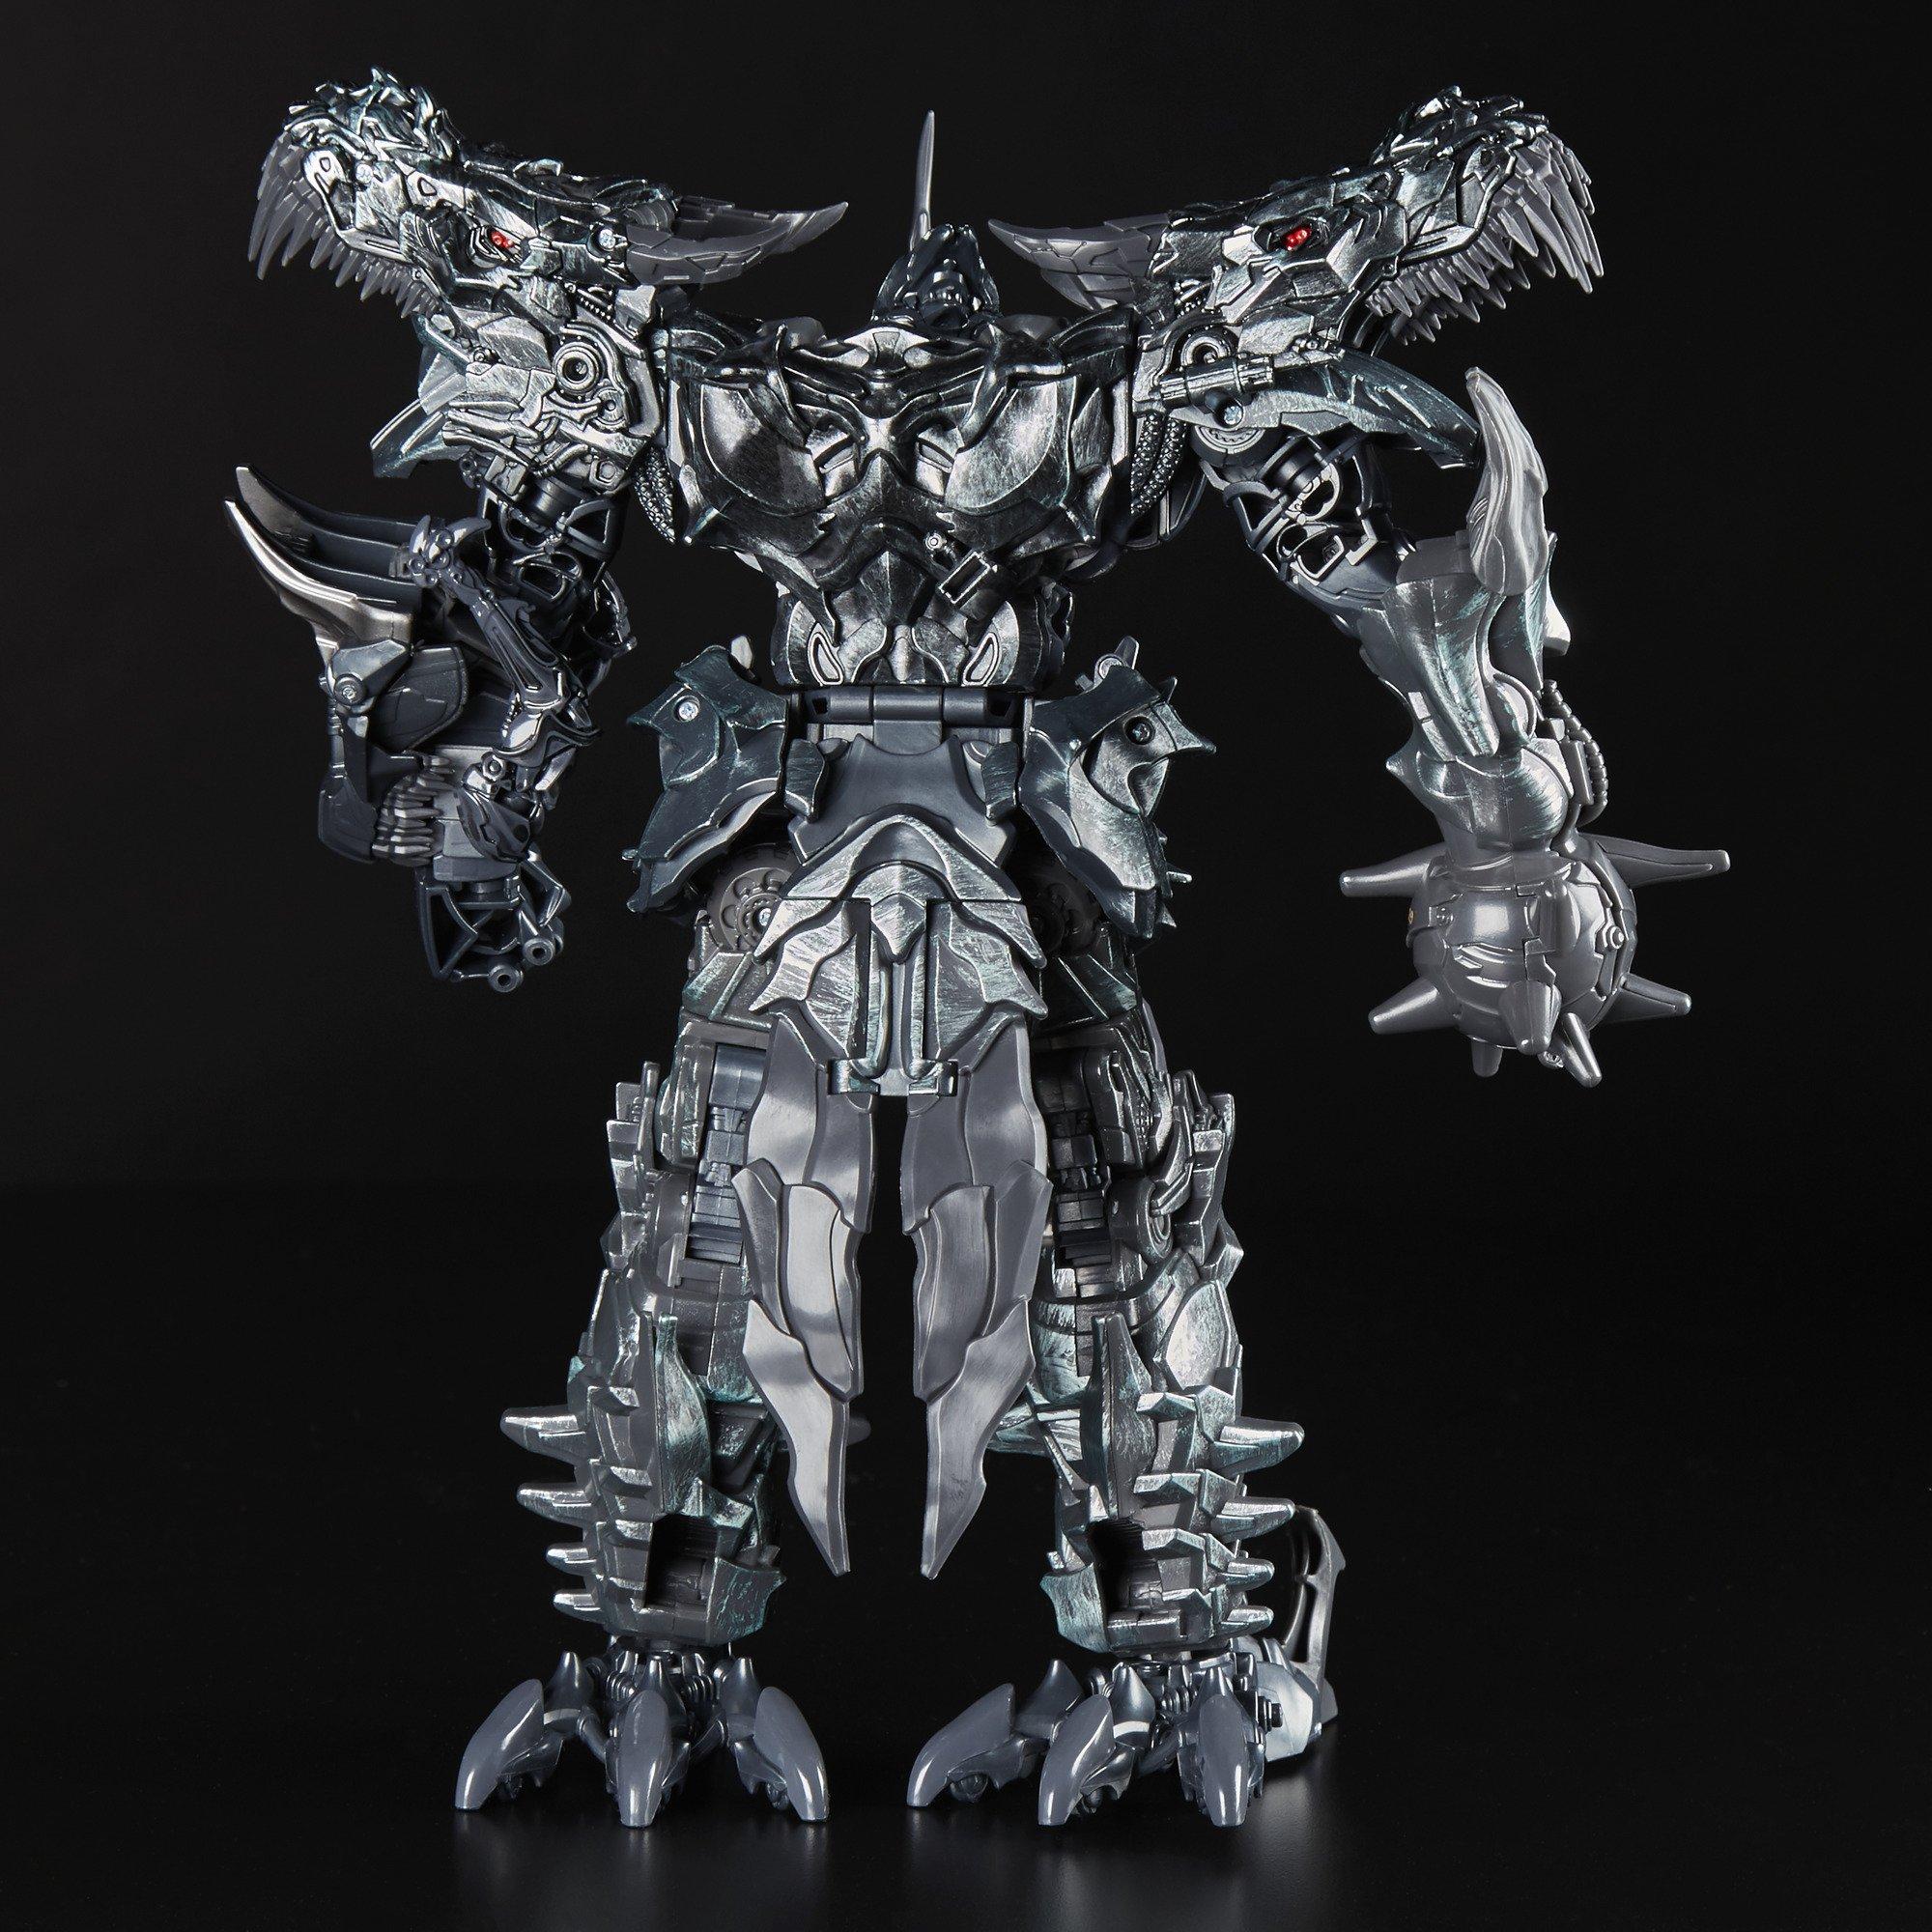 Transformers Studio Series 07 Leader Class Movie 4 Grimlock by Transformers (Image #4)